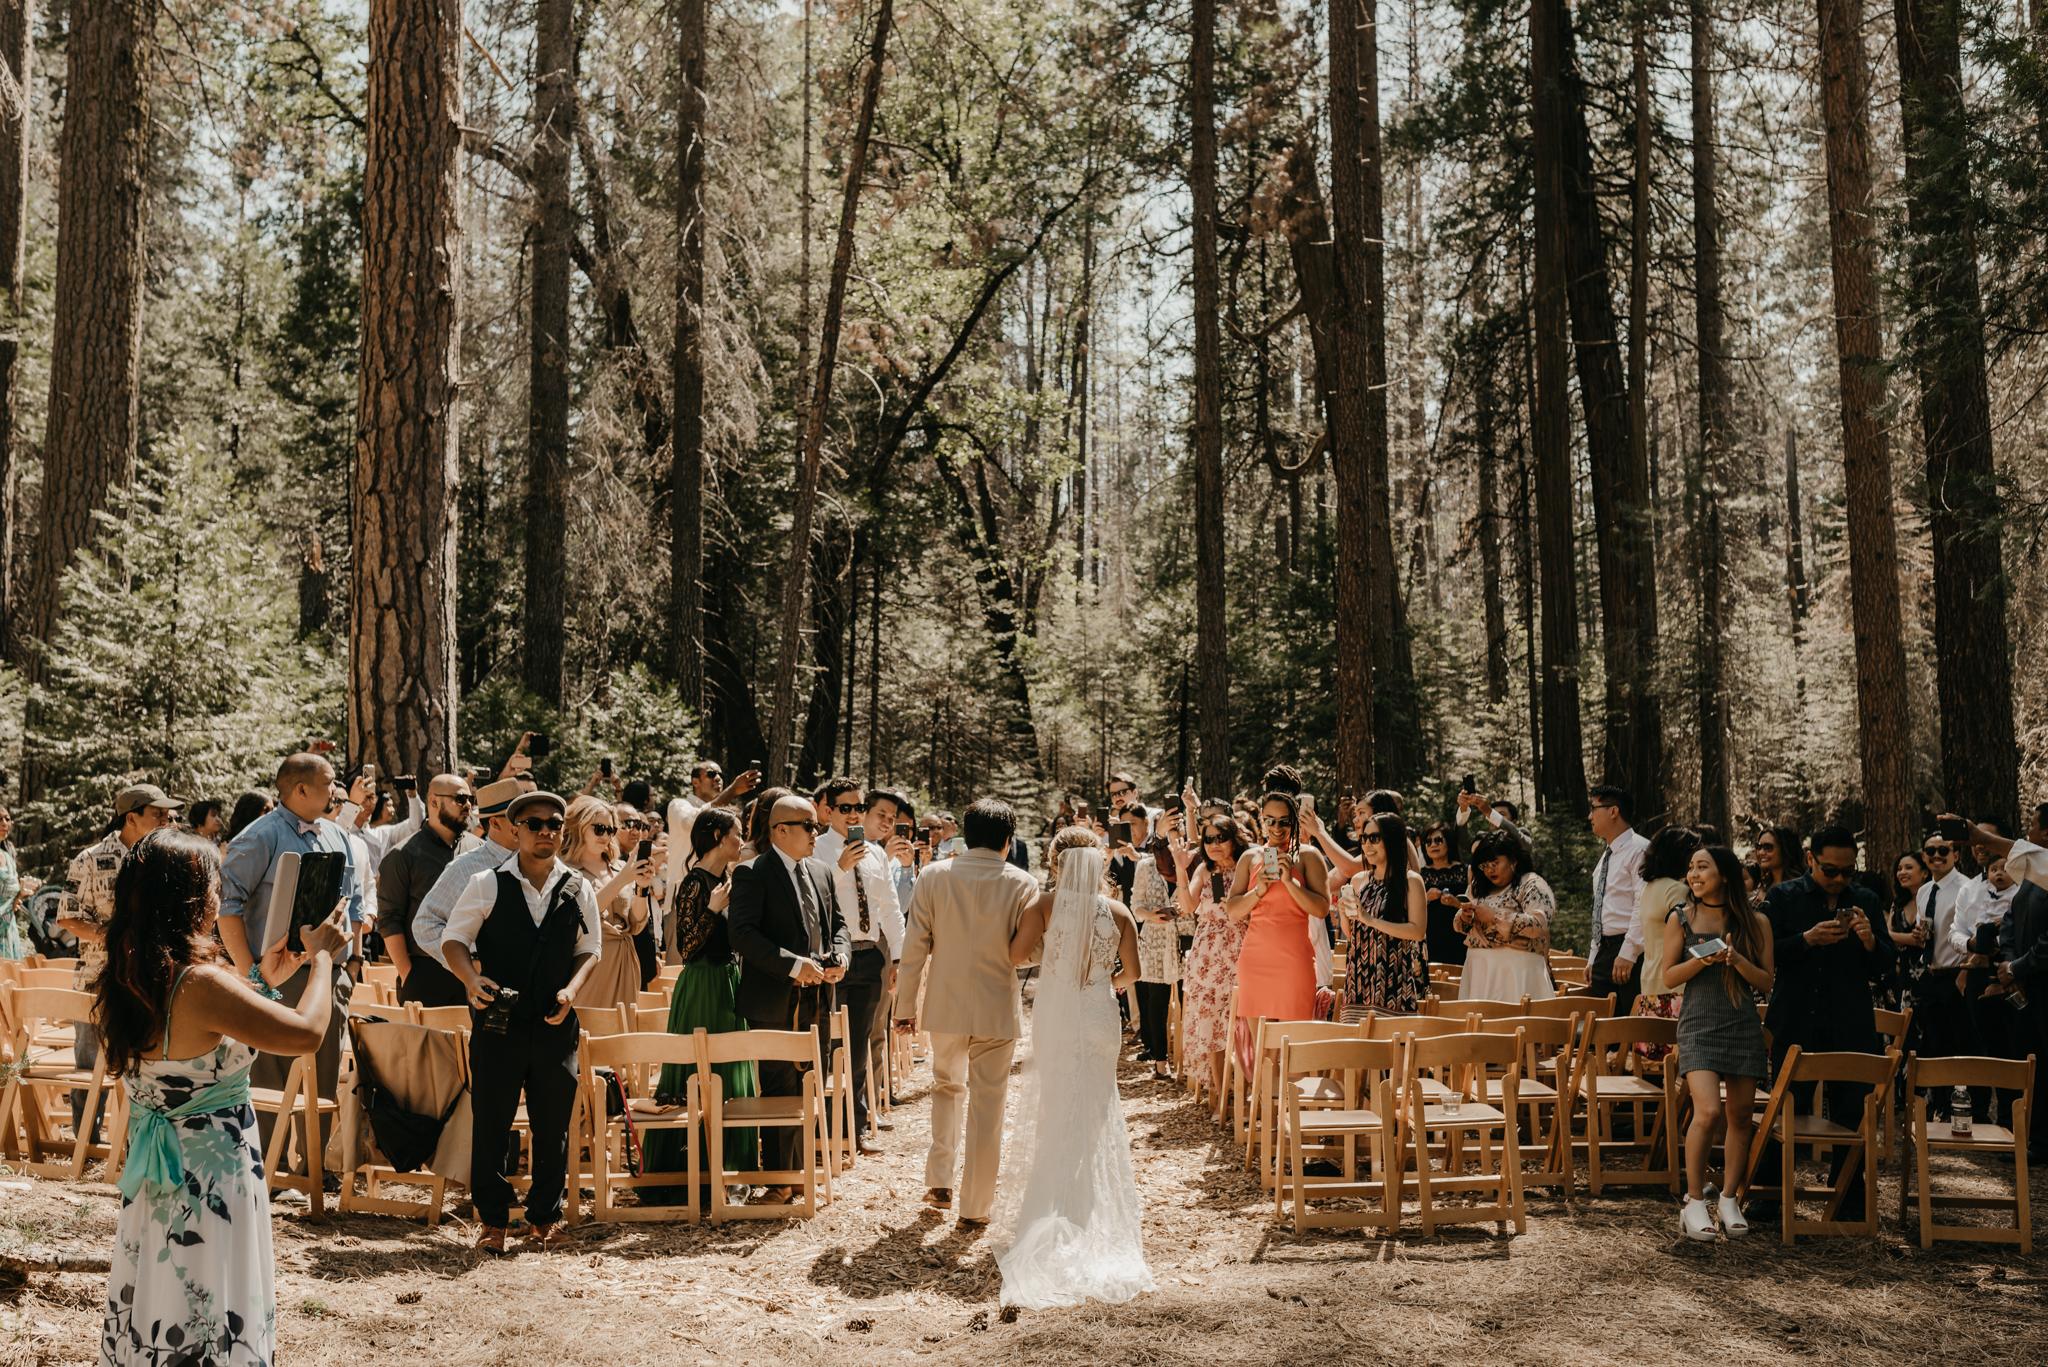 © Isaiah + Taylor Photography - Evergreen Lodge Destination Yoesmite Wedding - Los Angeles Wedding Photographer-108.jpg